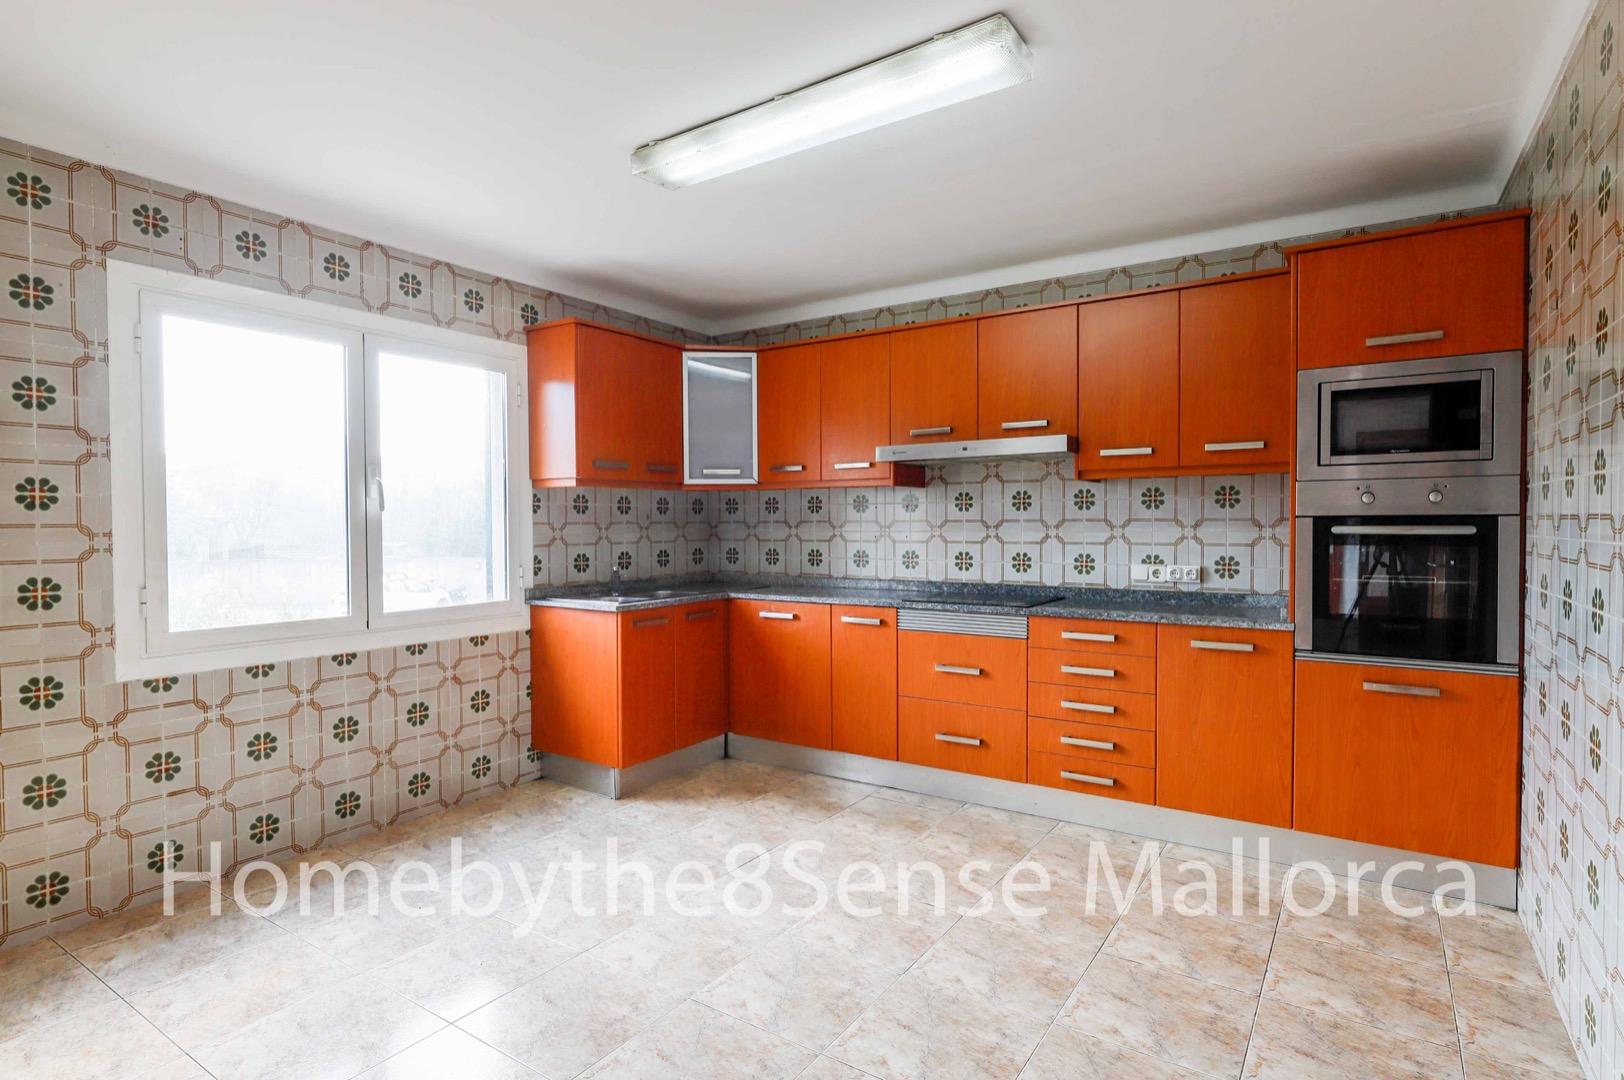 Affitto Appartamento  Marratxí, zona de - Marratxí. Inmobiliaria home by the8sense ofrece en alquiler muy grande pis